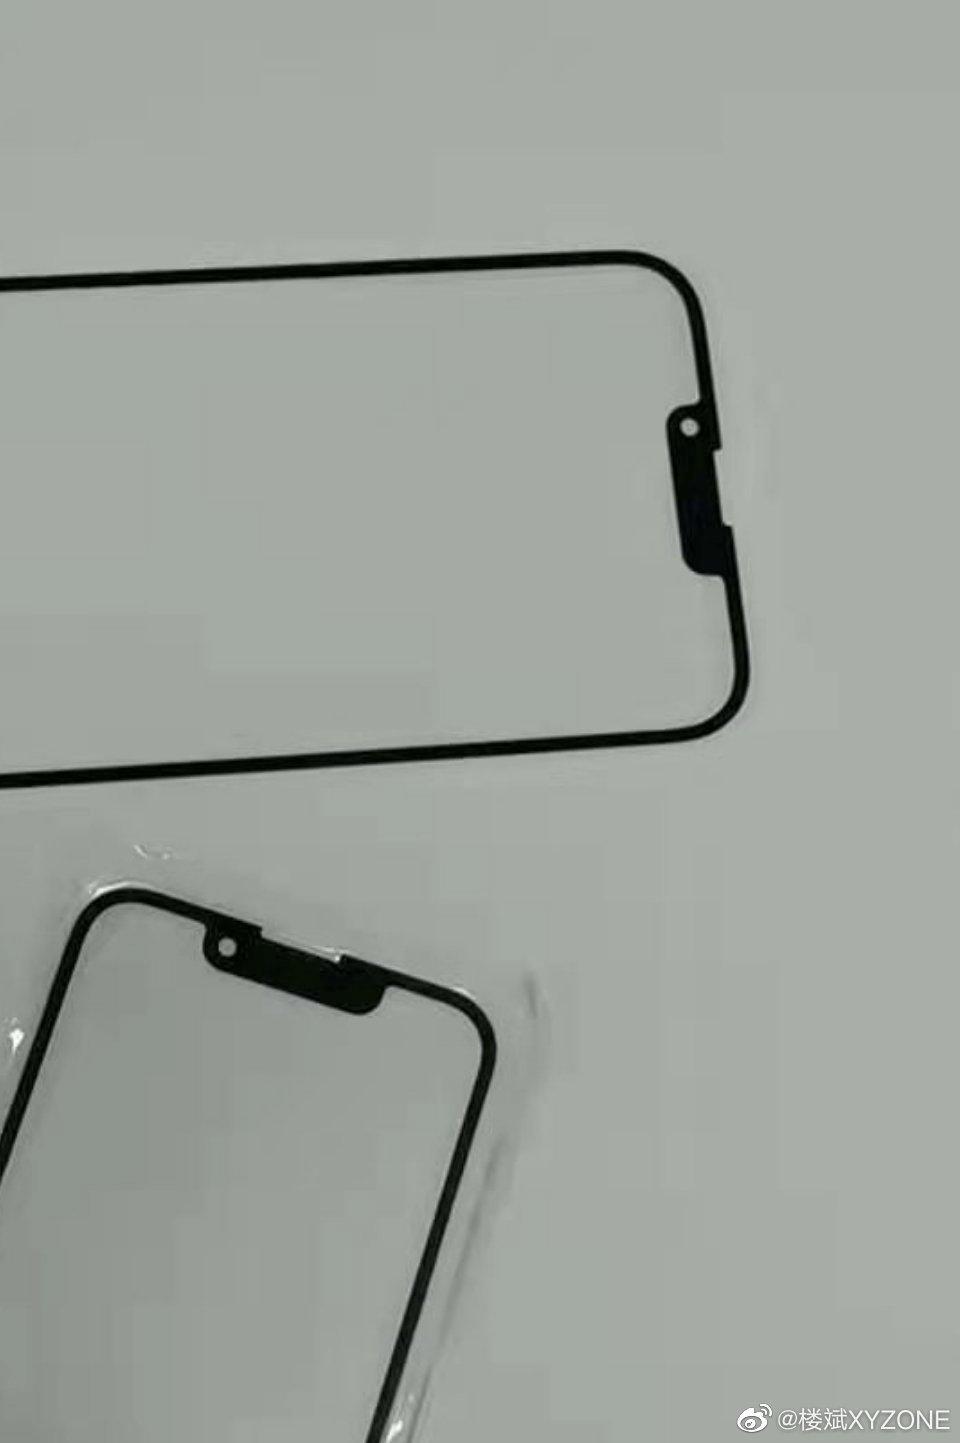 duanrui-iphone13-notch-samples-1.jpeg